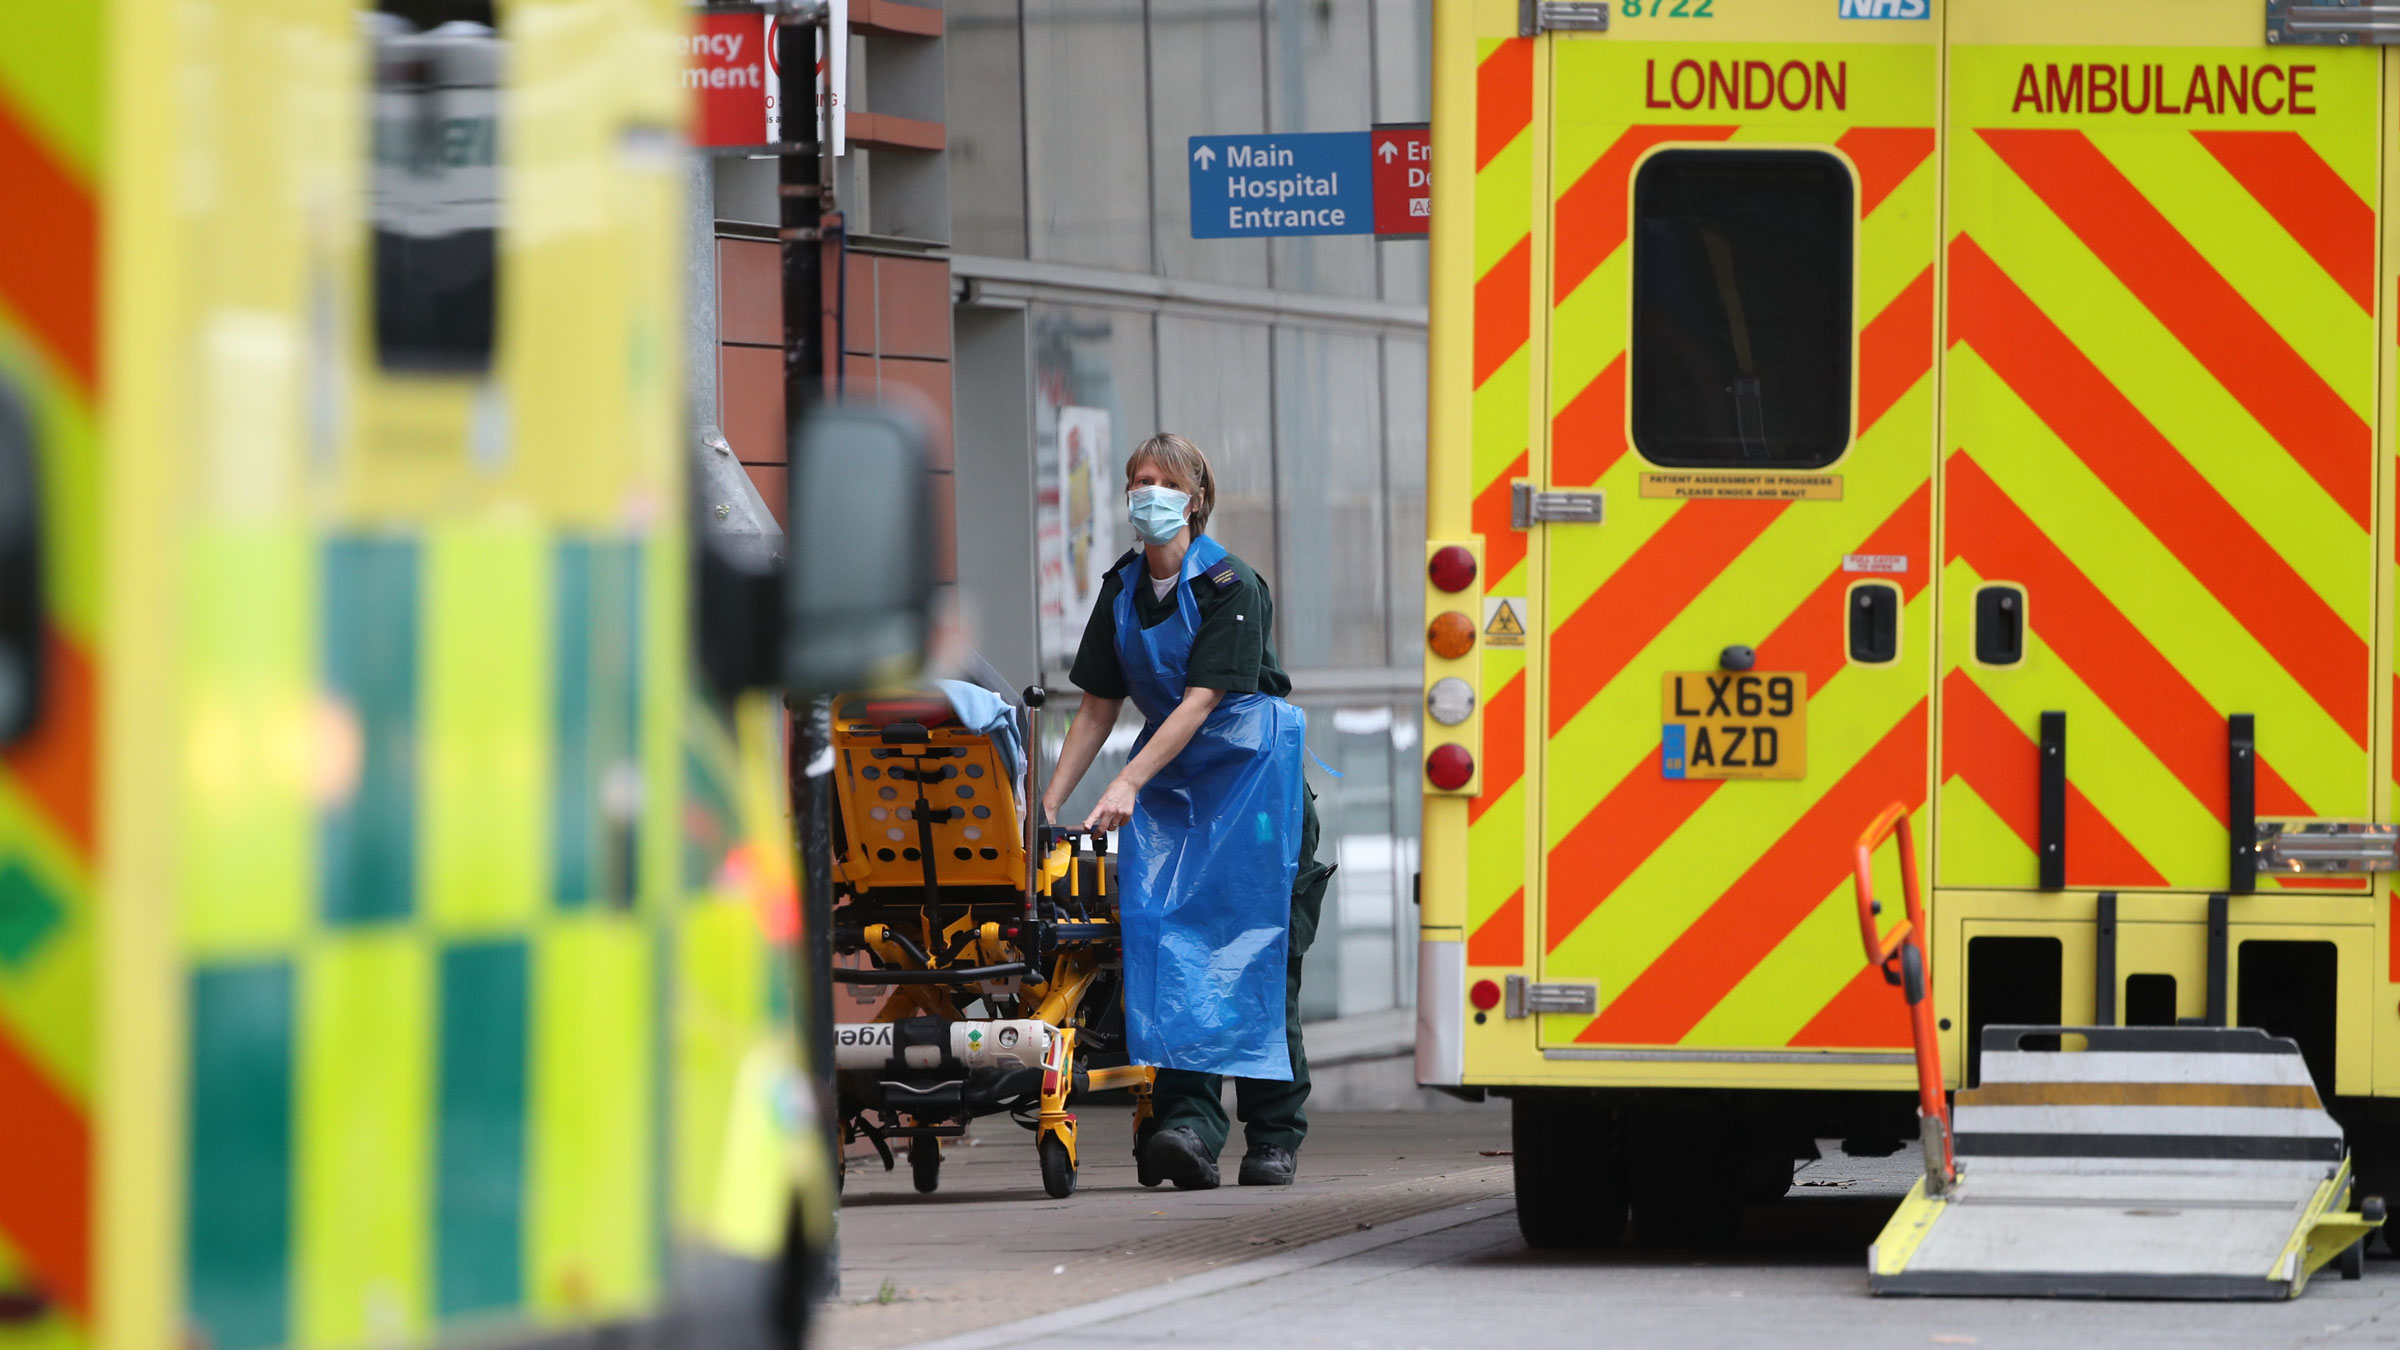 A paramedic wheels a gurney outside the Royal London Hospital on Thursday, January 21.